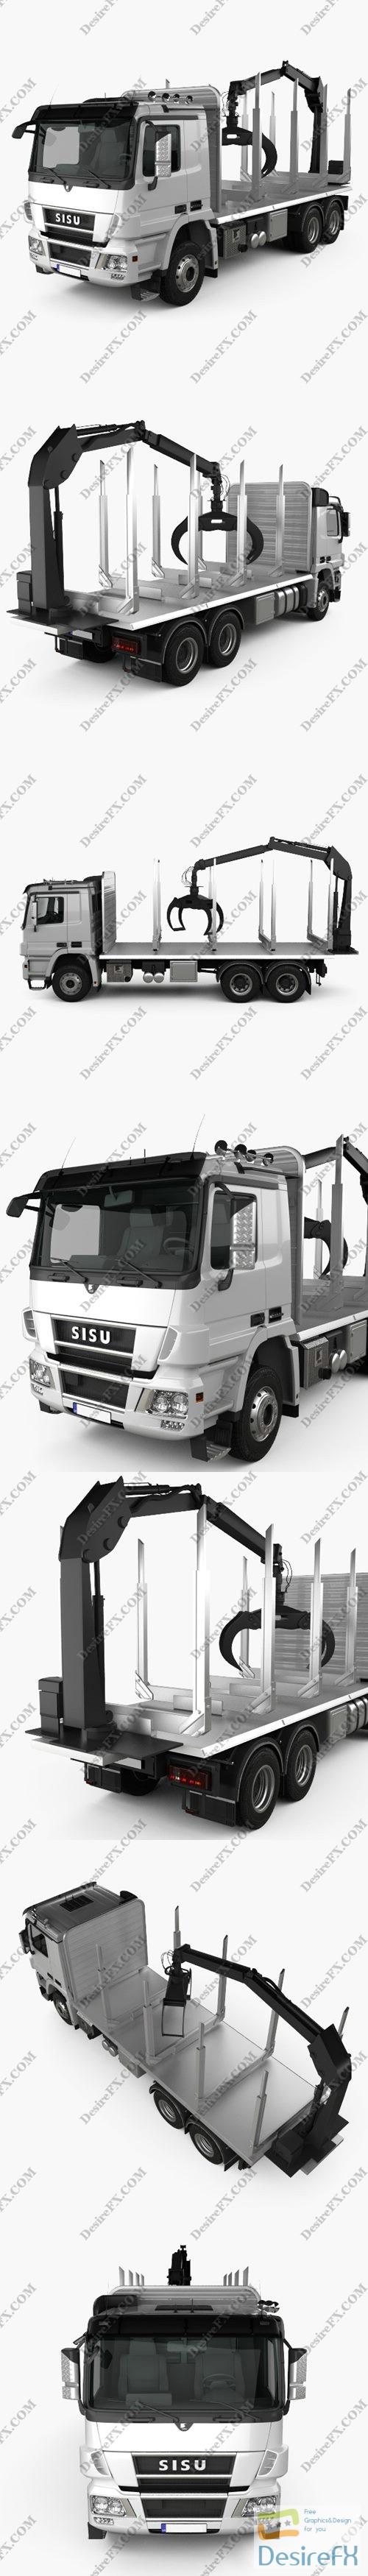 3d-models - Sisu Polar Logging Truck 2010 3D Model